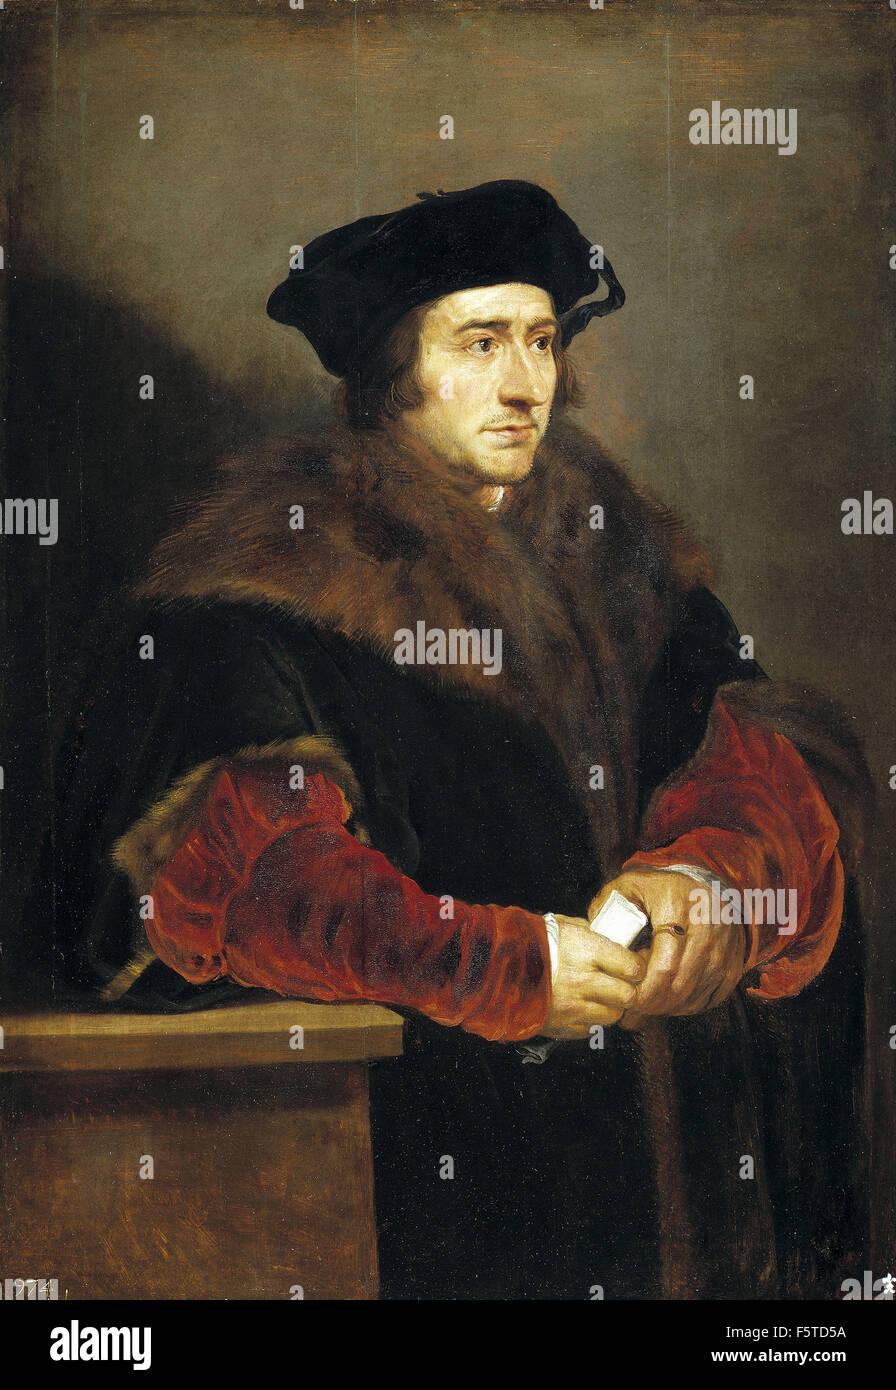 Peter Paul Rubens - Sir Thomas More - Stock Image